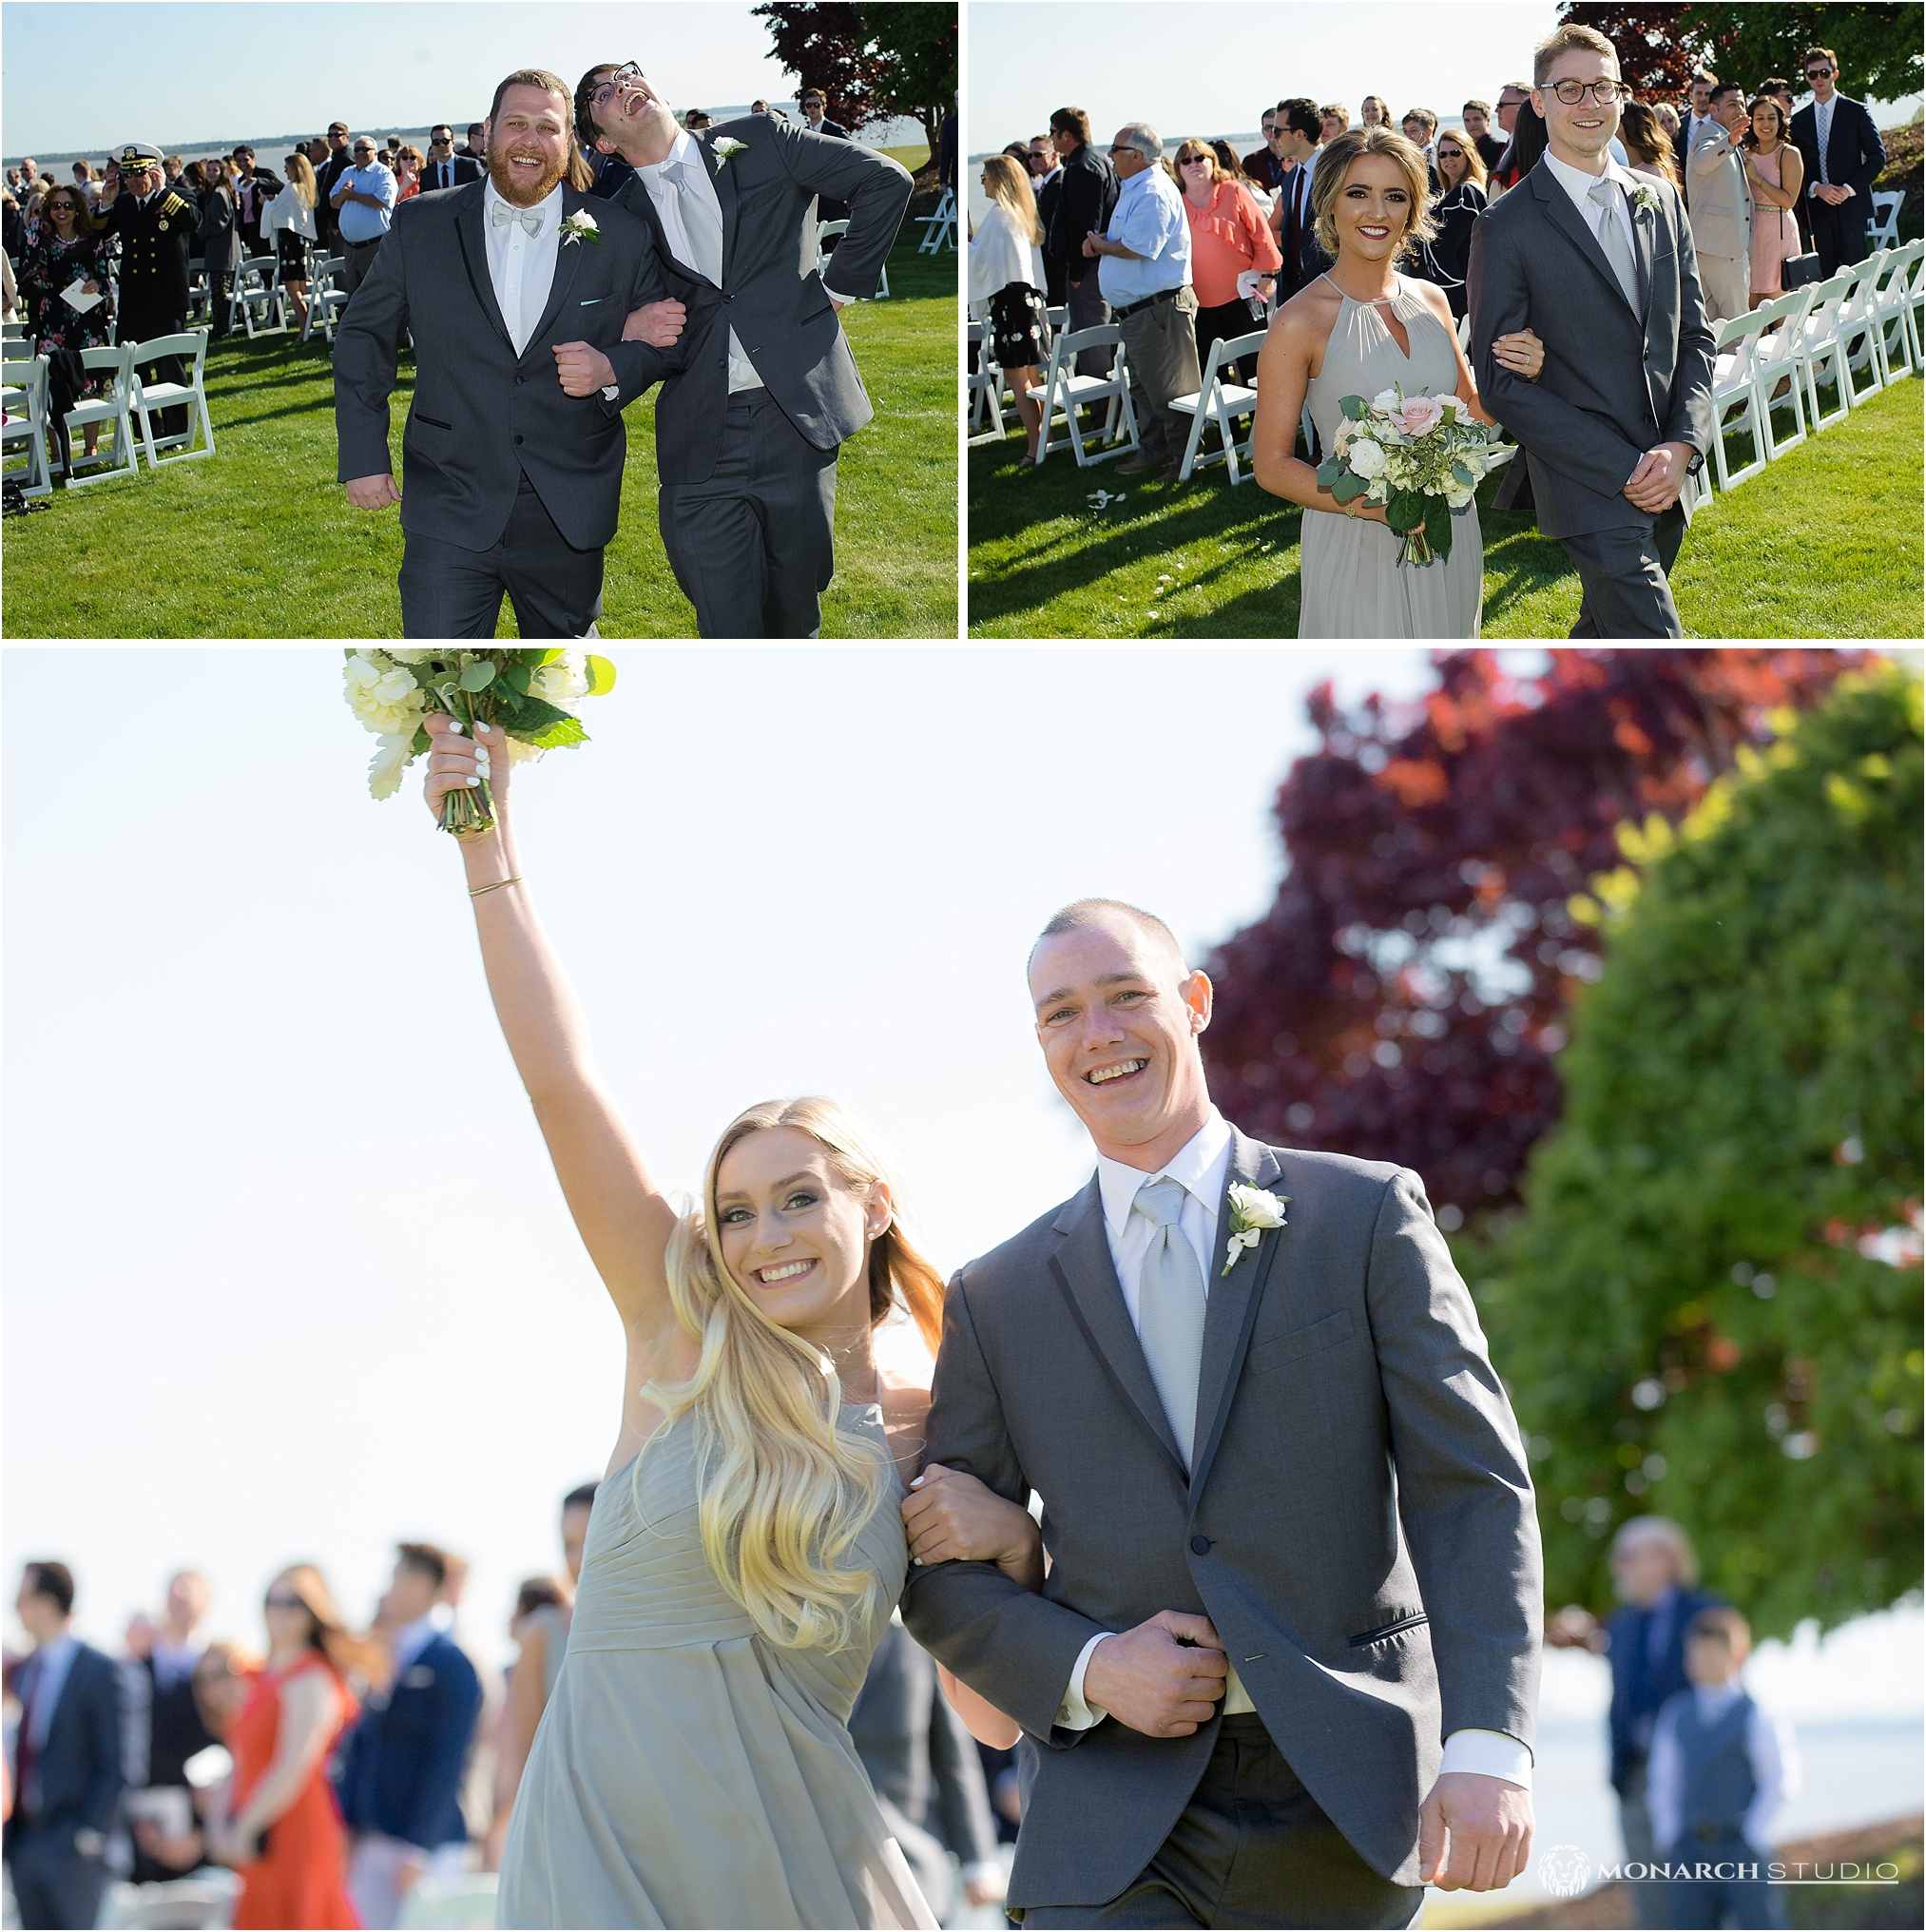 williamsburg-virginia-wedding-photographer-065.jpg